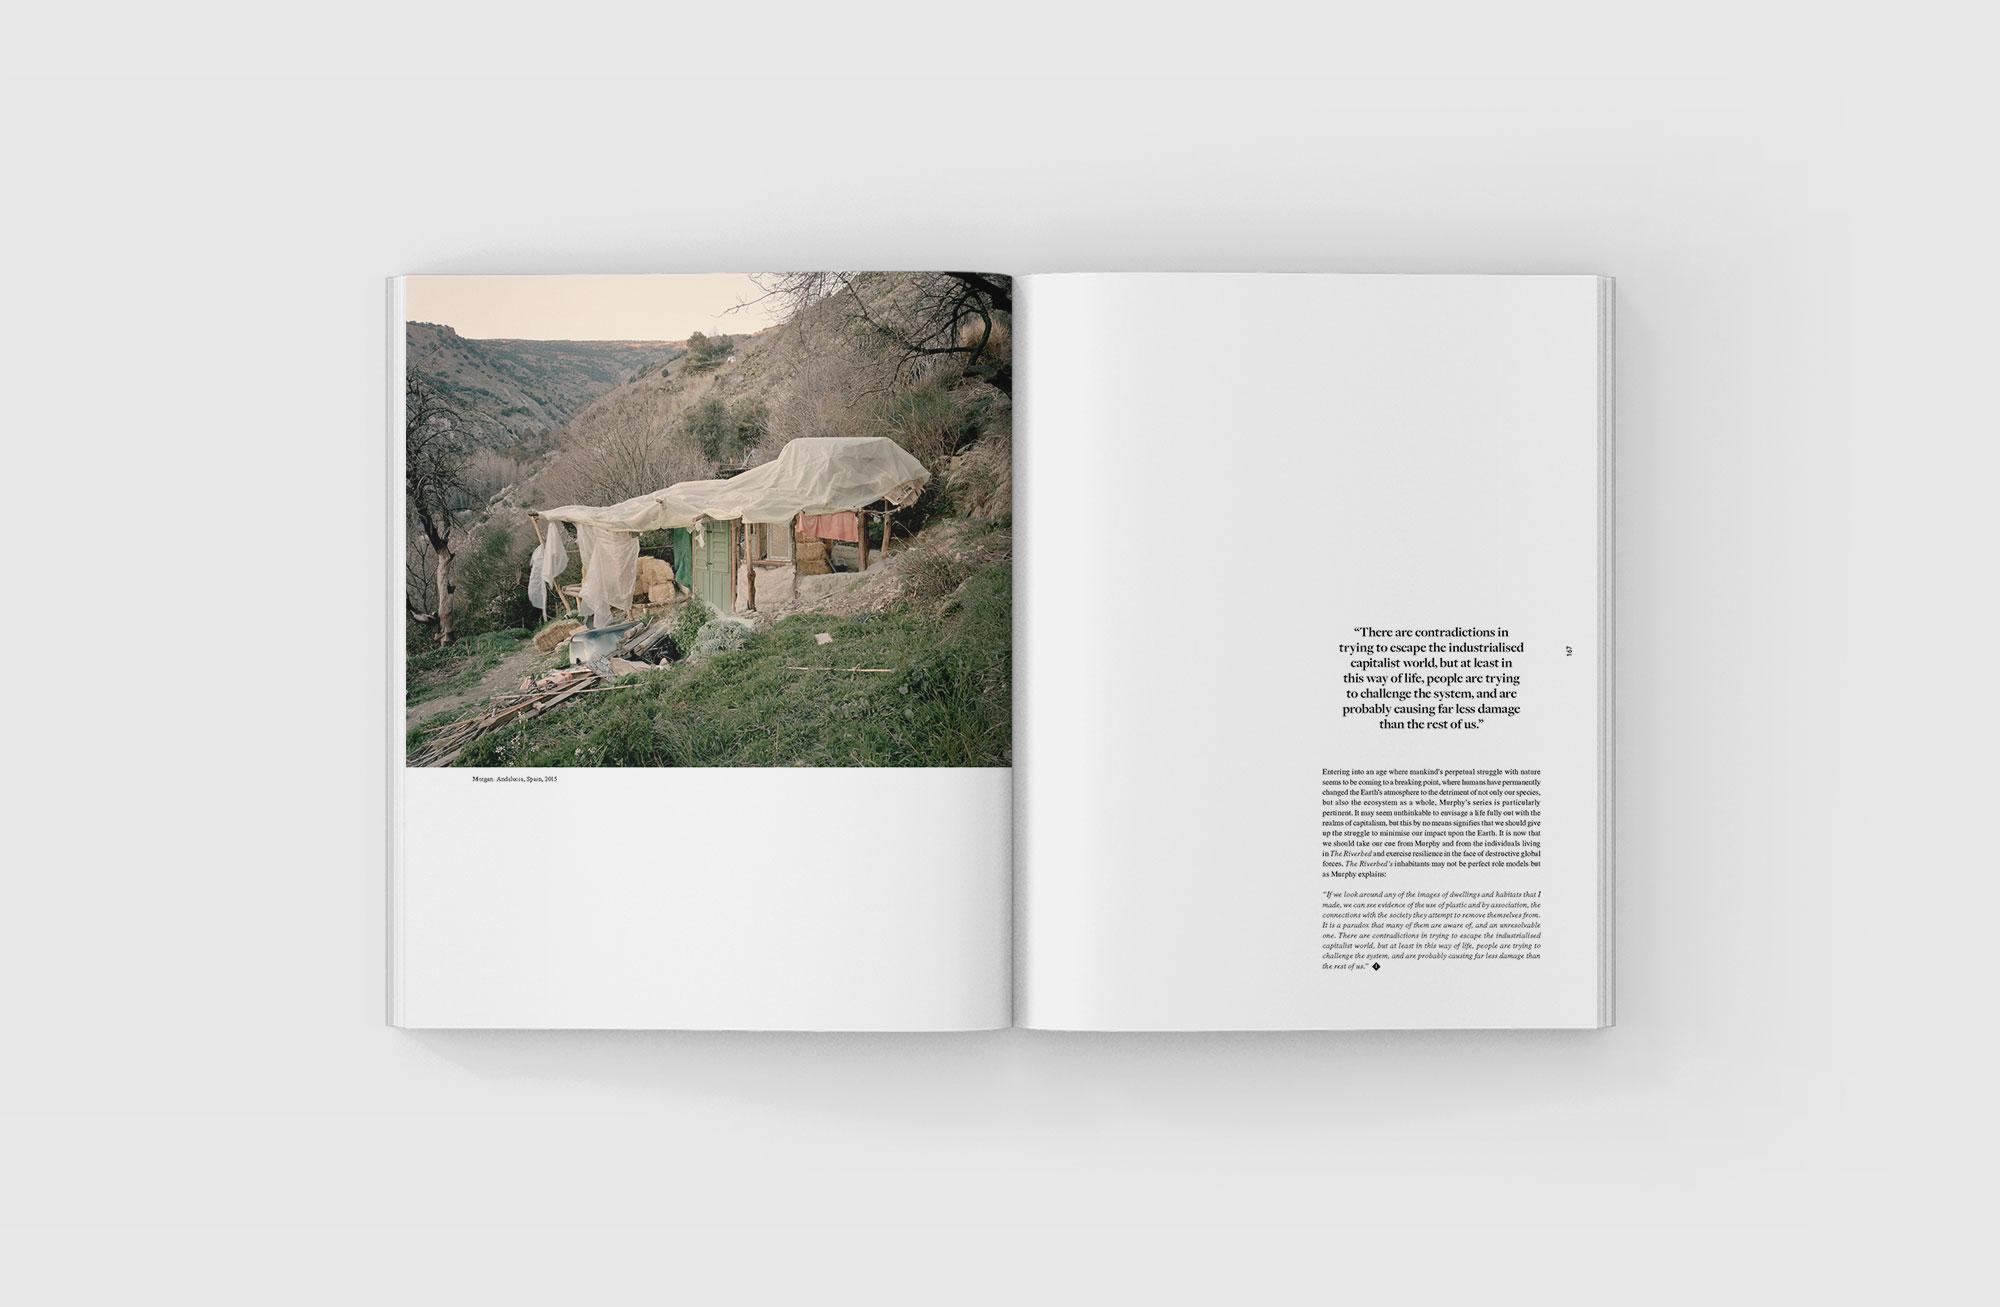 jungle-magazine-02-26.jpg